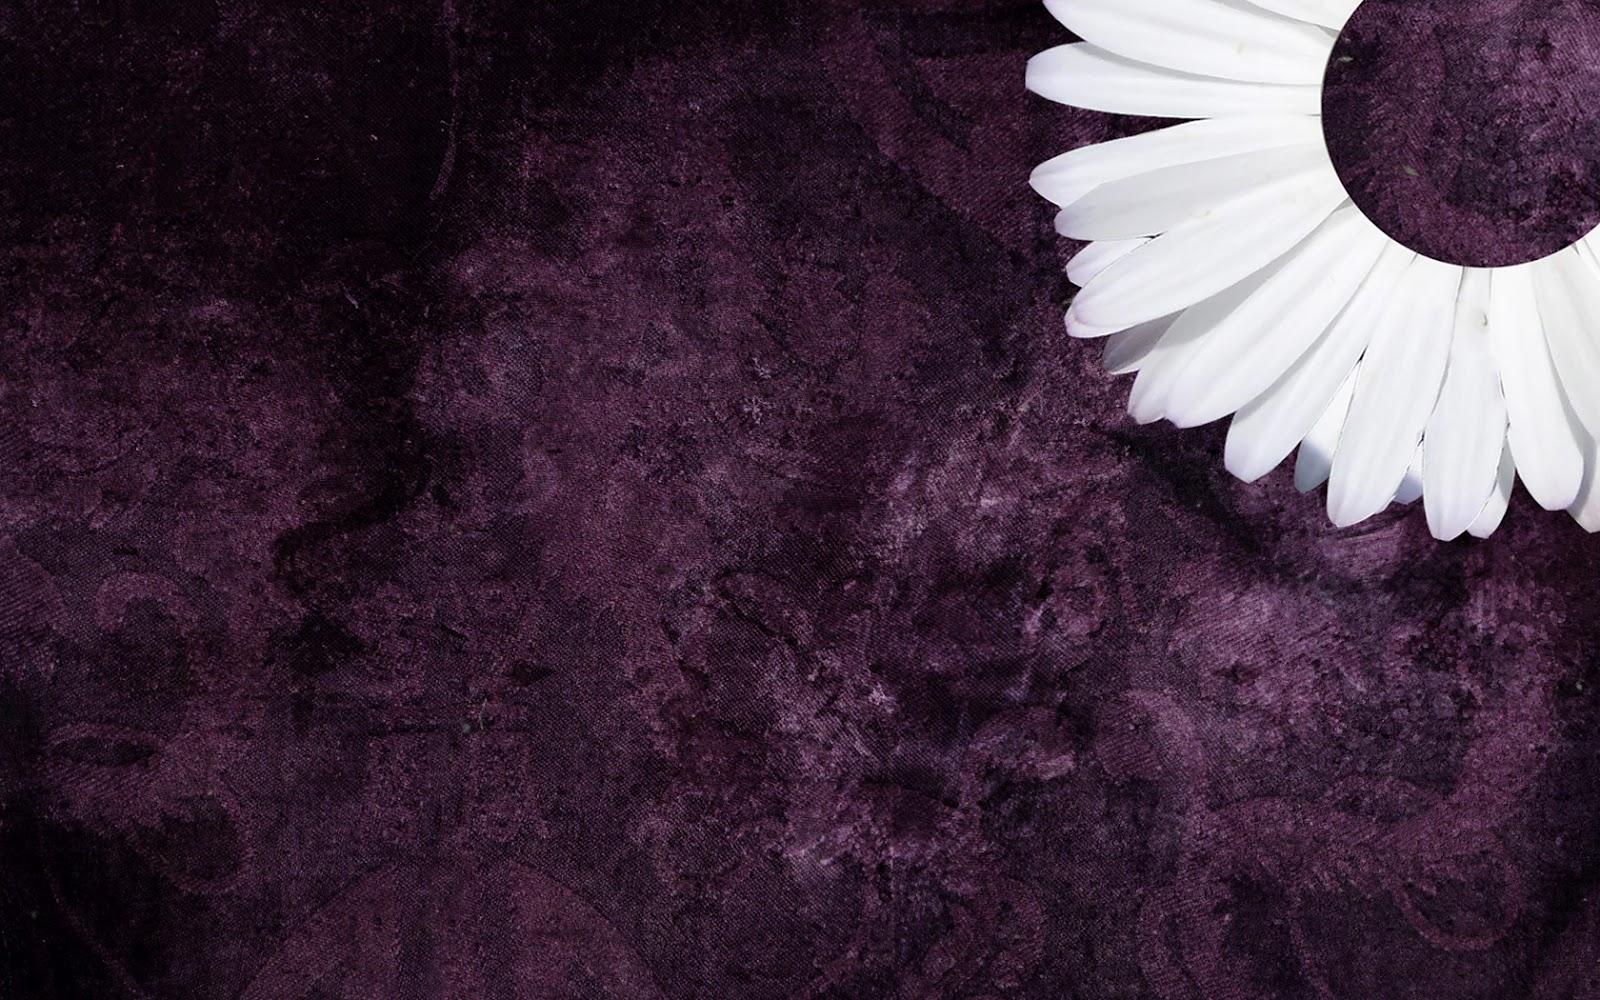 Purple Daisy Tumblr Backgrounds   ibjennyjenny Photography and 1600x1000